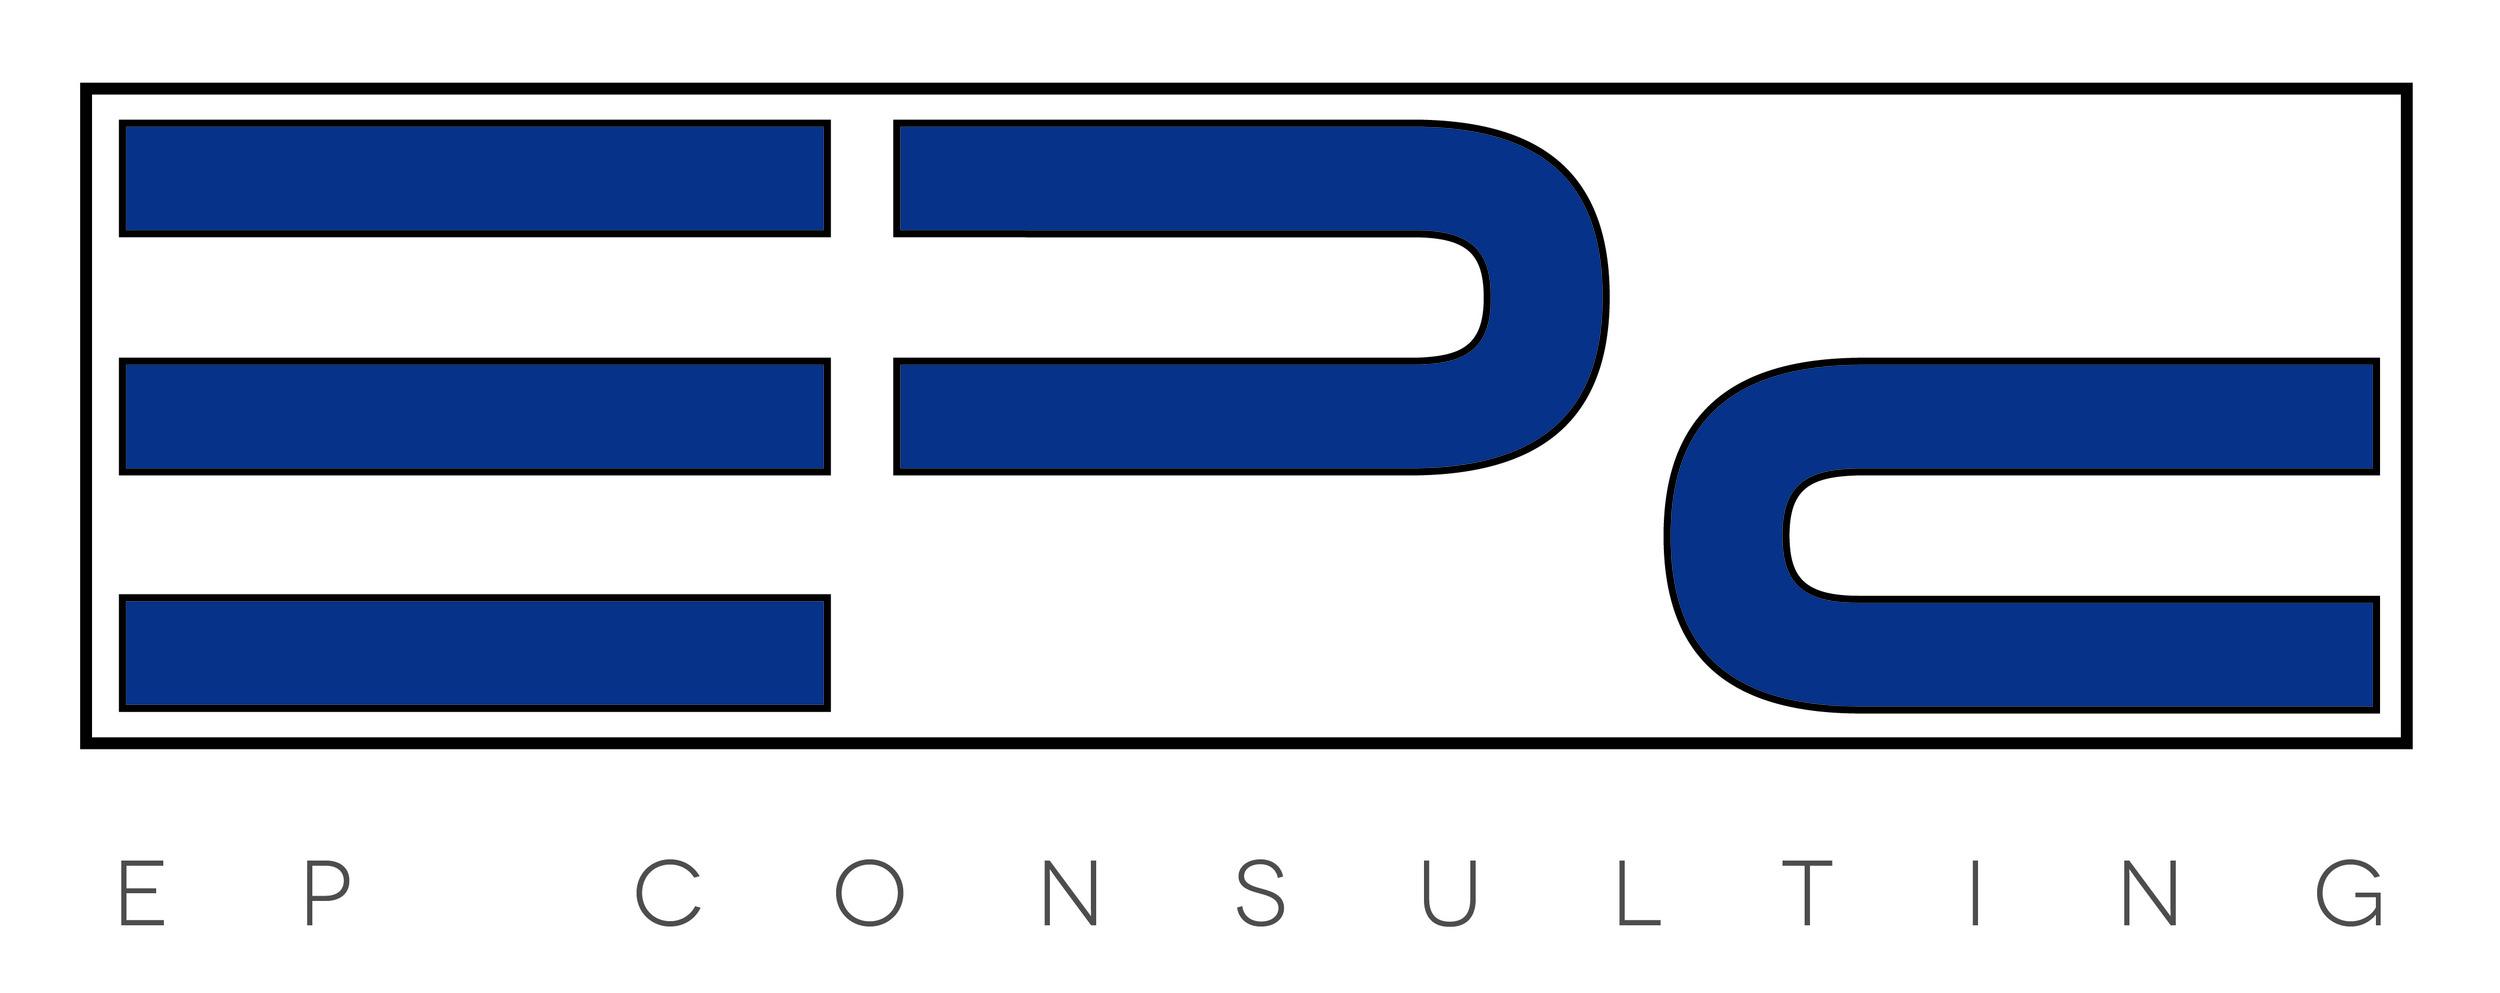 JPG For Web_EP Consulting Logo Normal.jpg